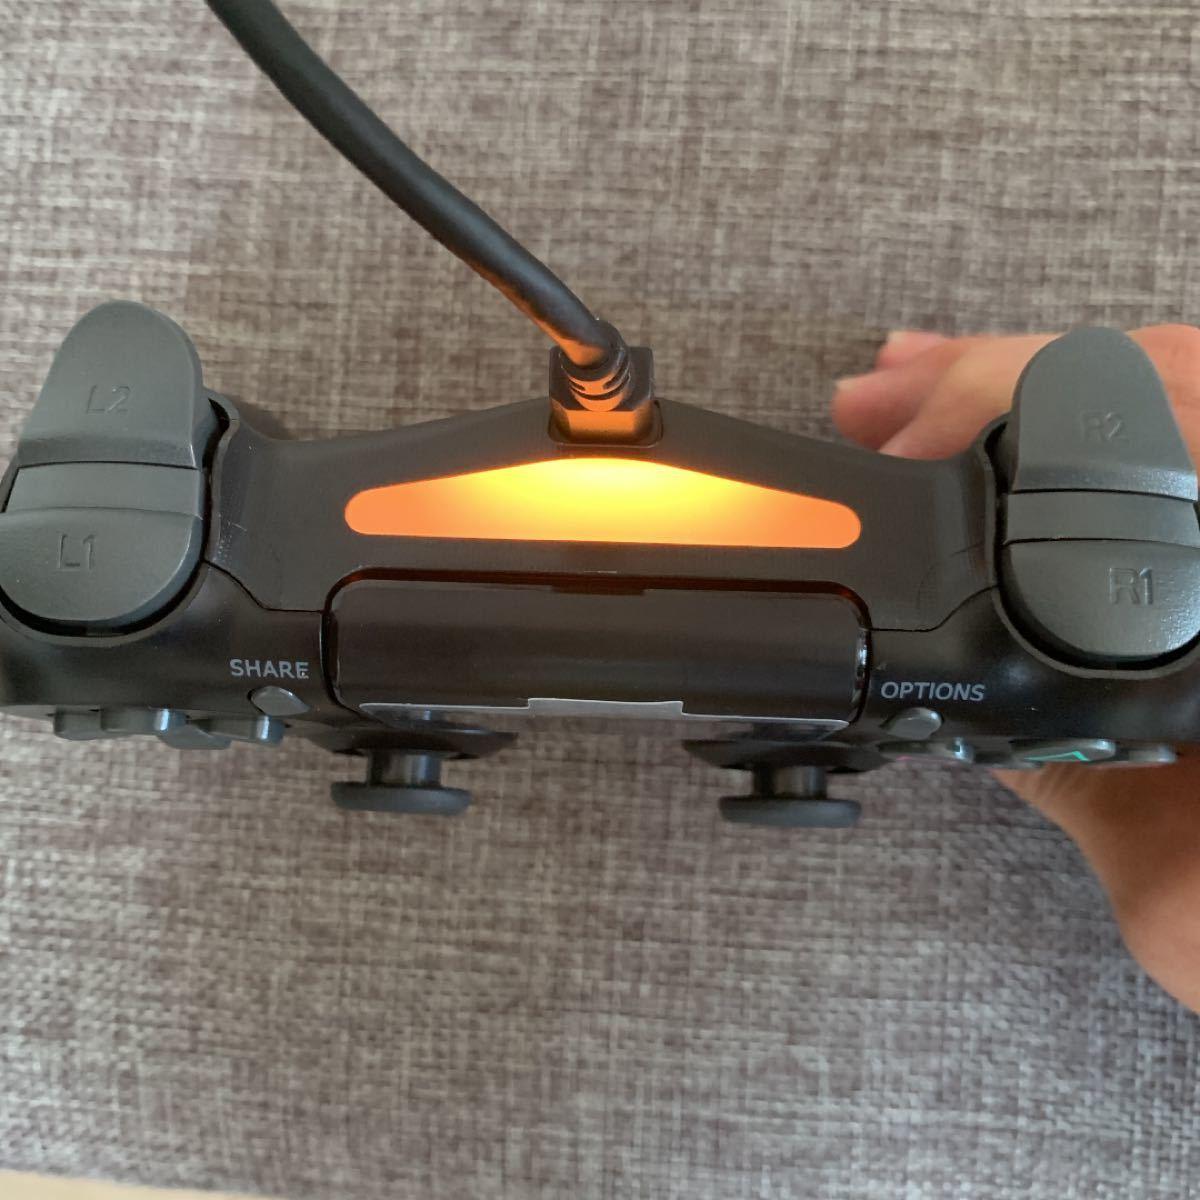 【PS4】新品 ワイヤレスコントローラ互換品 ps4コントローラー USB付き PS4コントローラー SONY